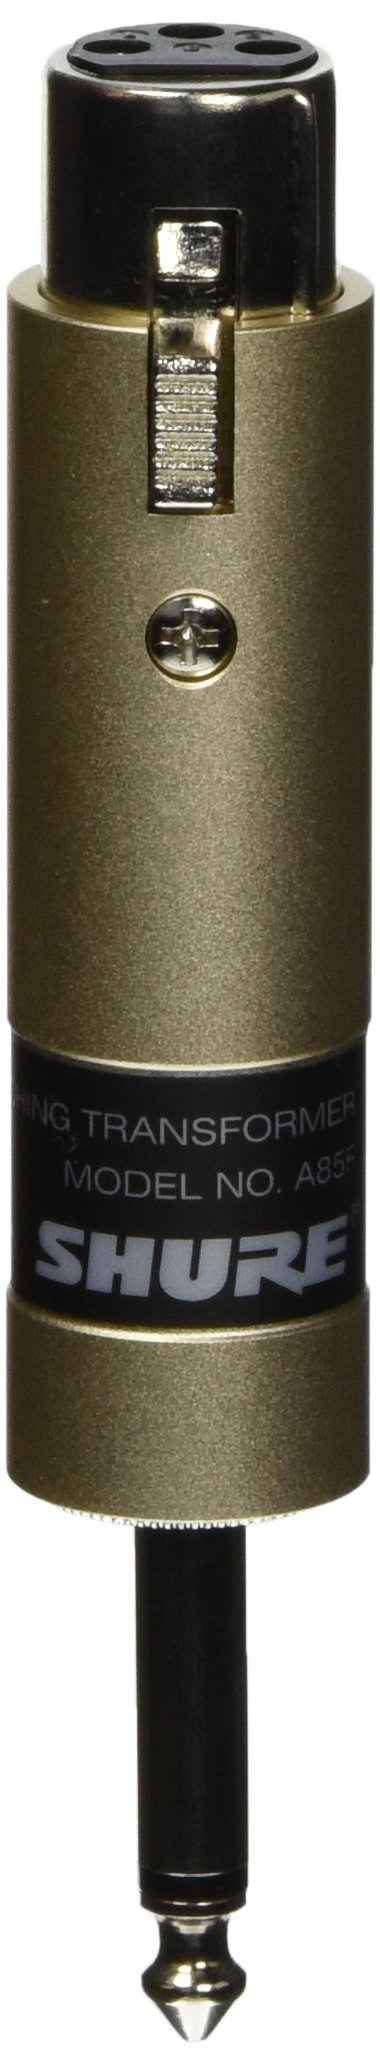 Shure A85F Transformer; Low Z, Female XLR to High Z 1/4-Inch Phone Plug